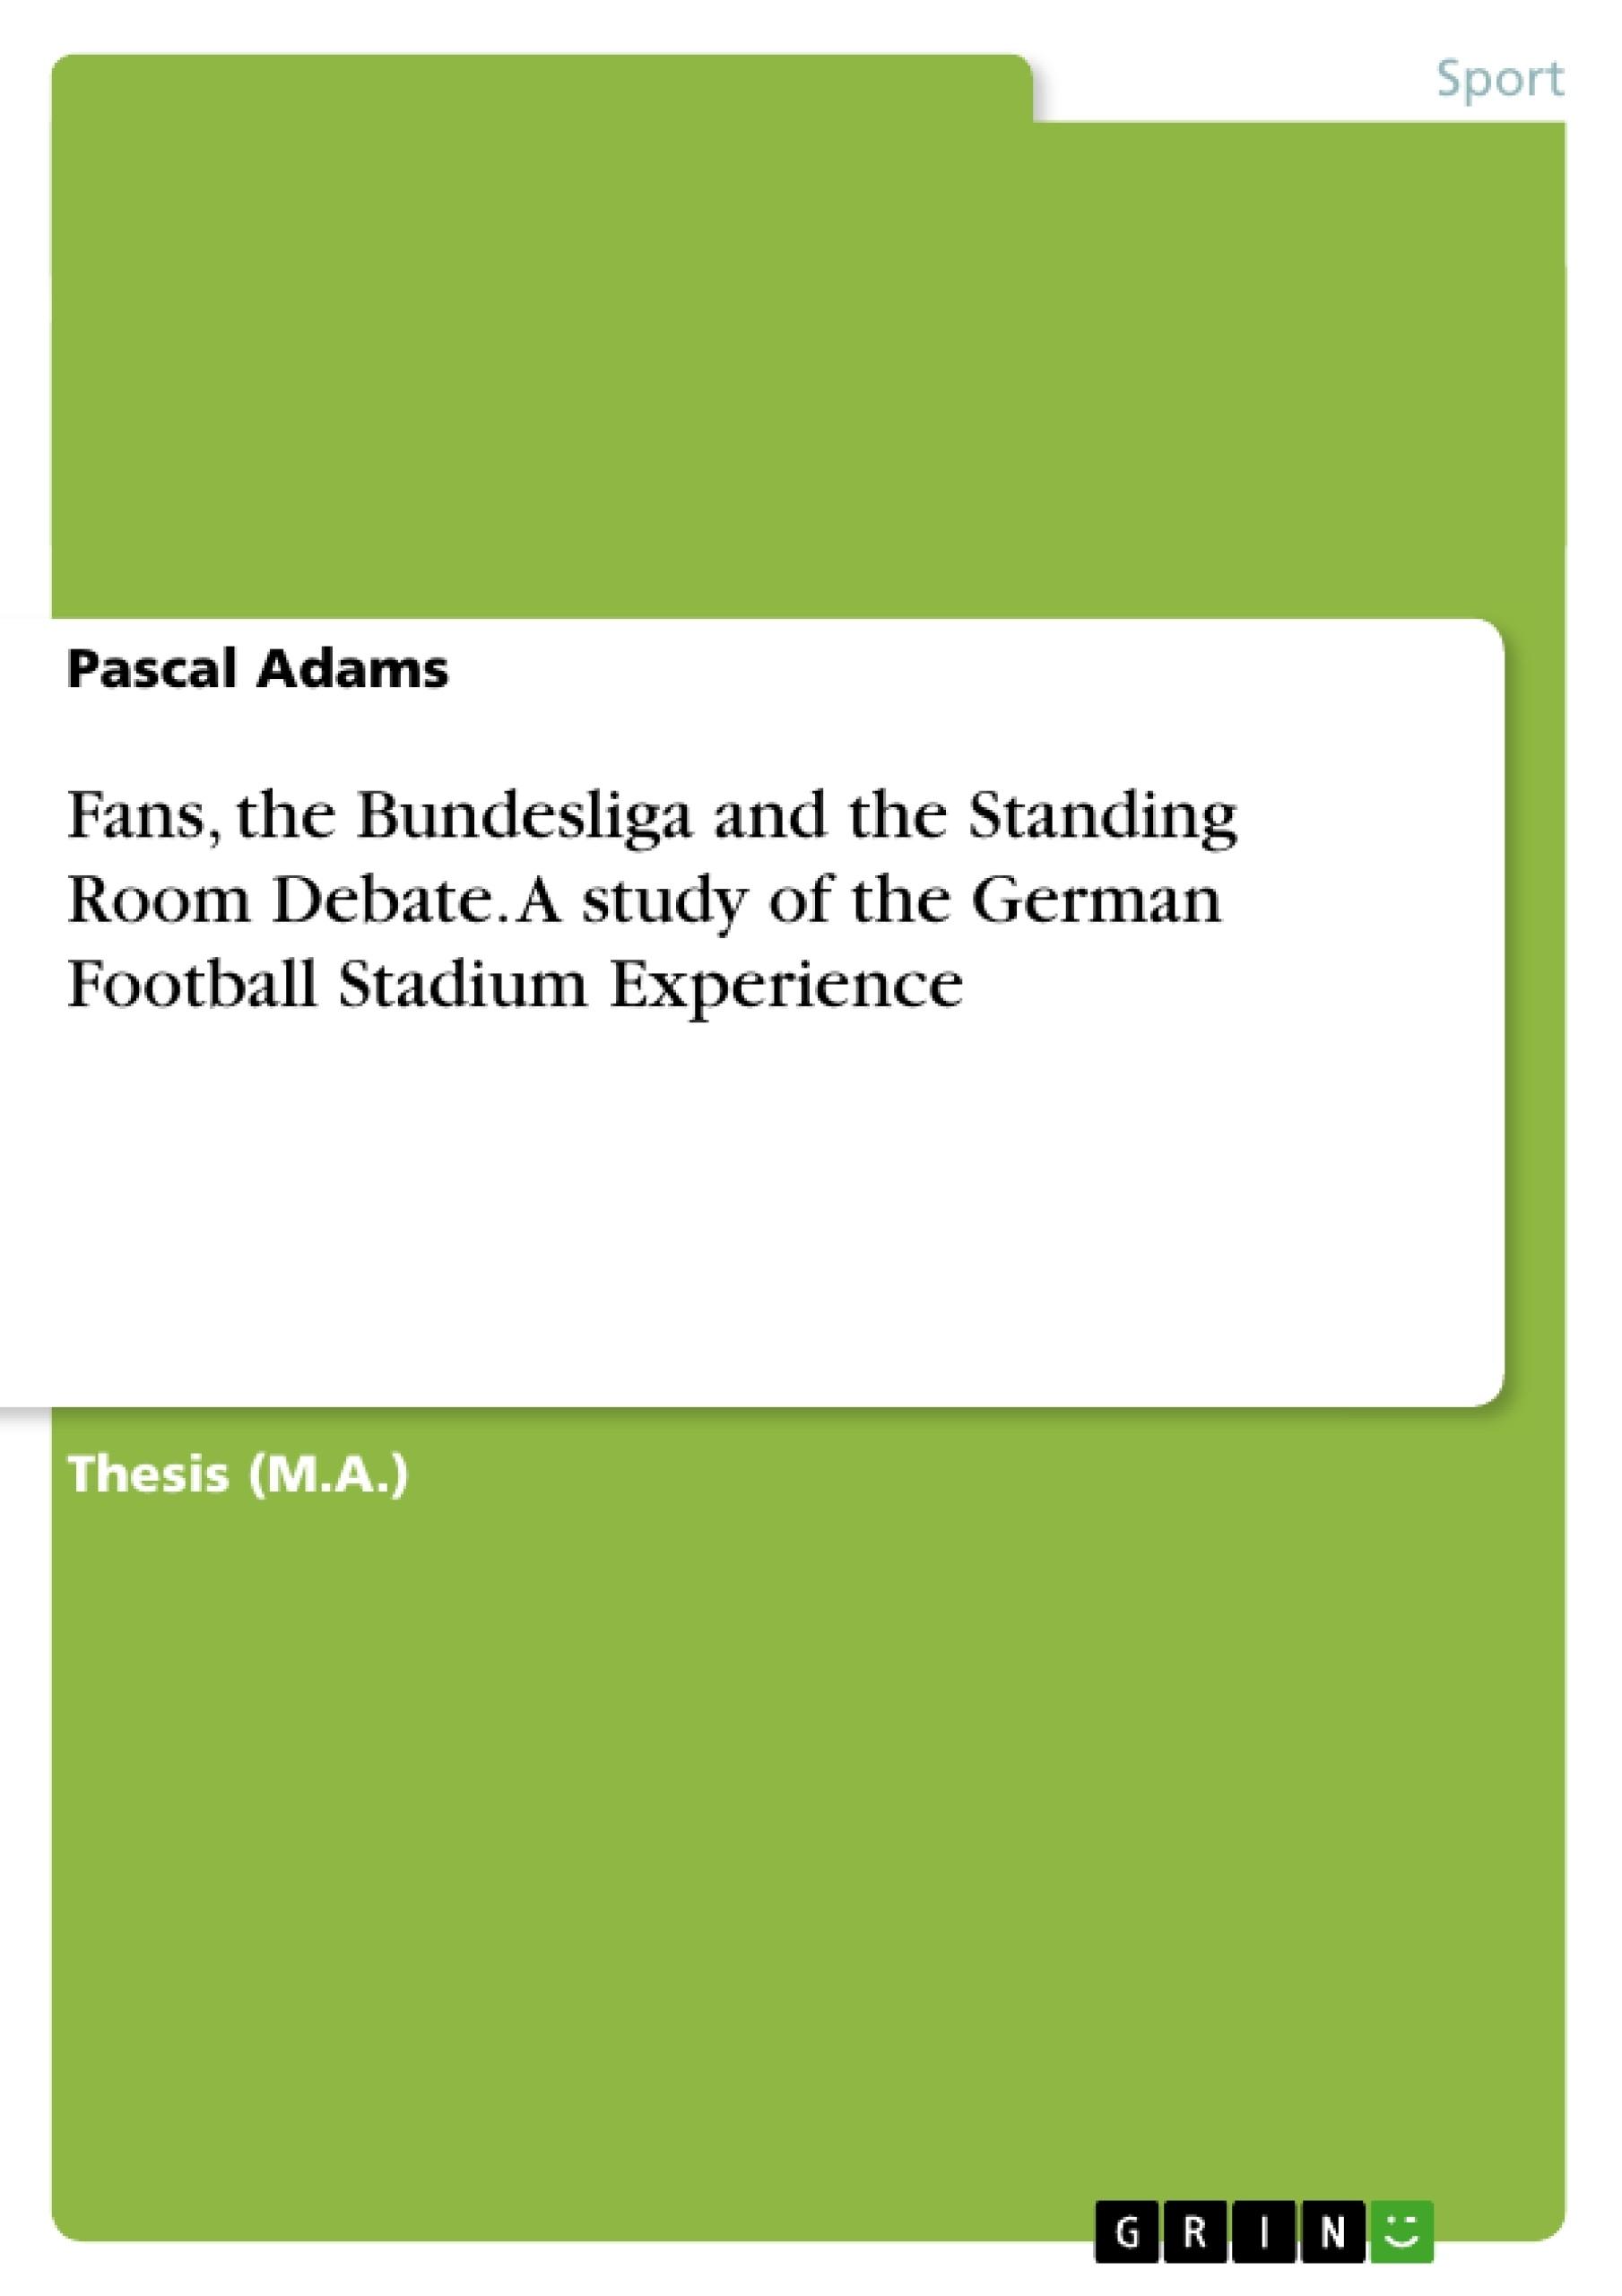 Room debate research papers passe